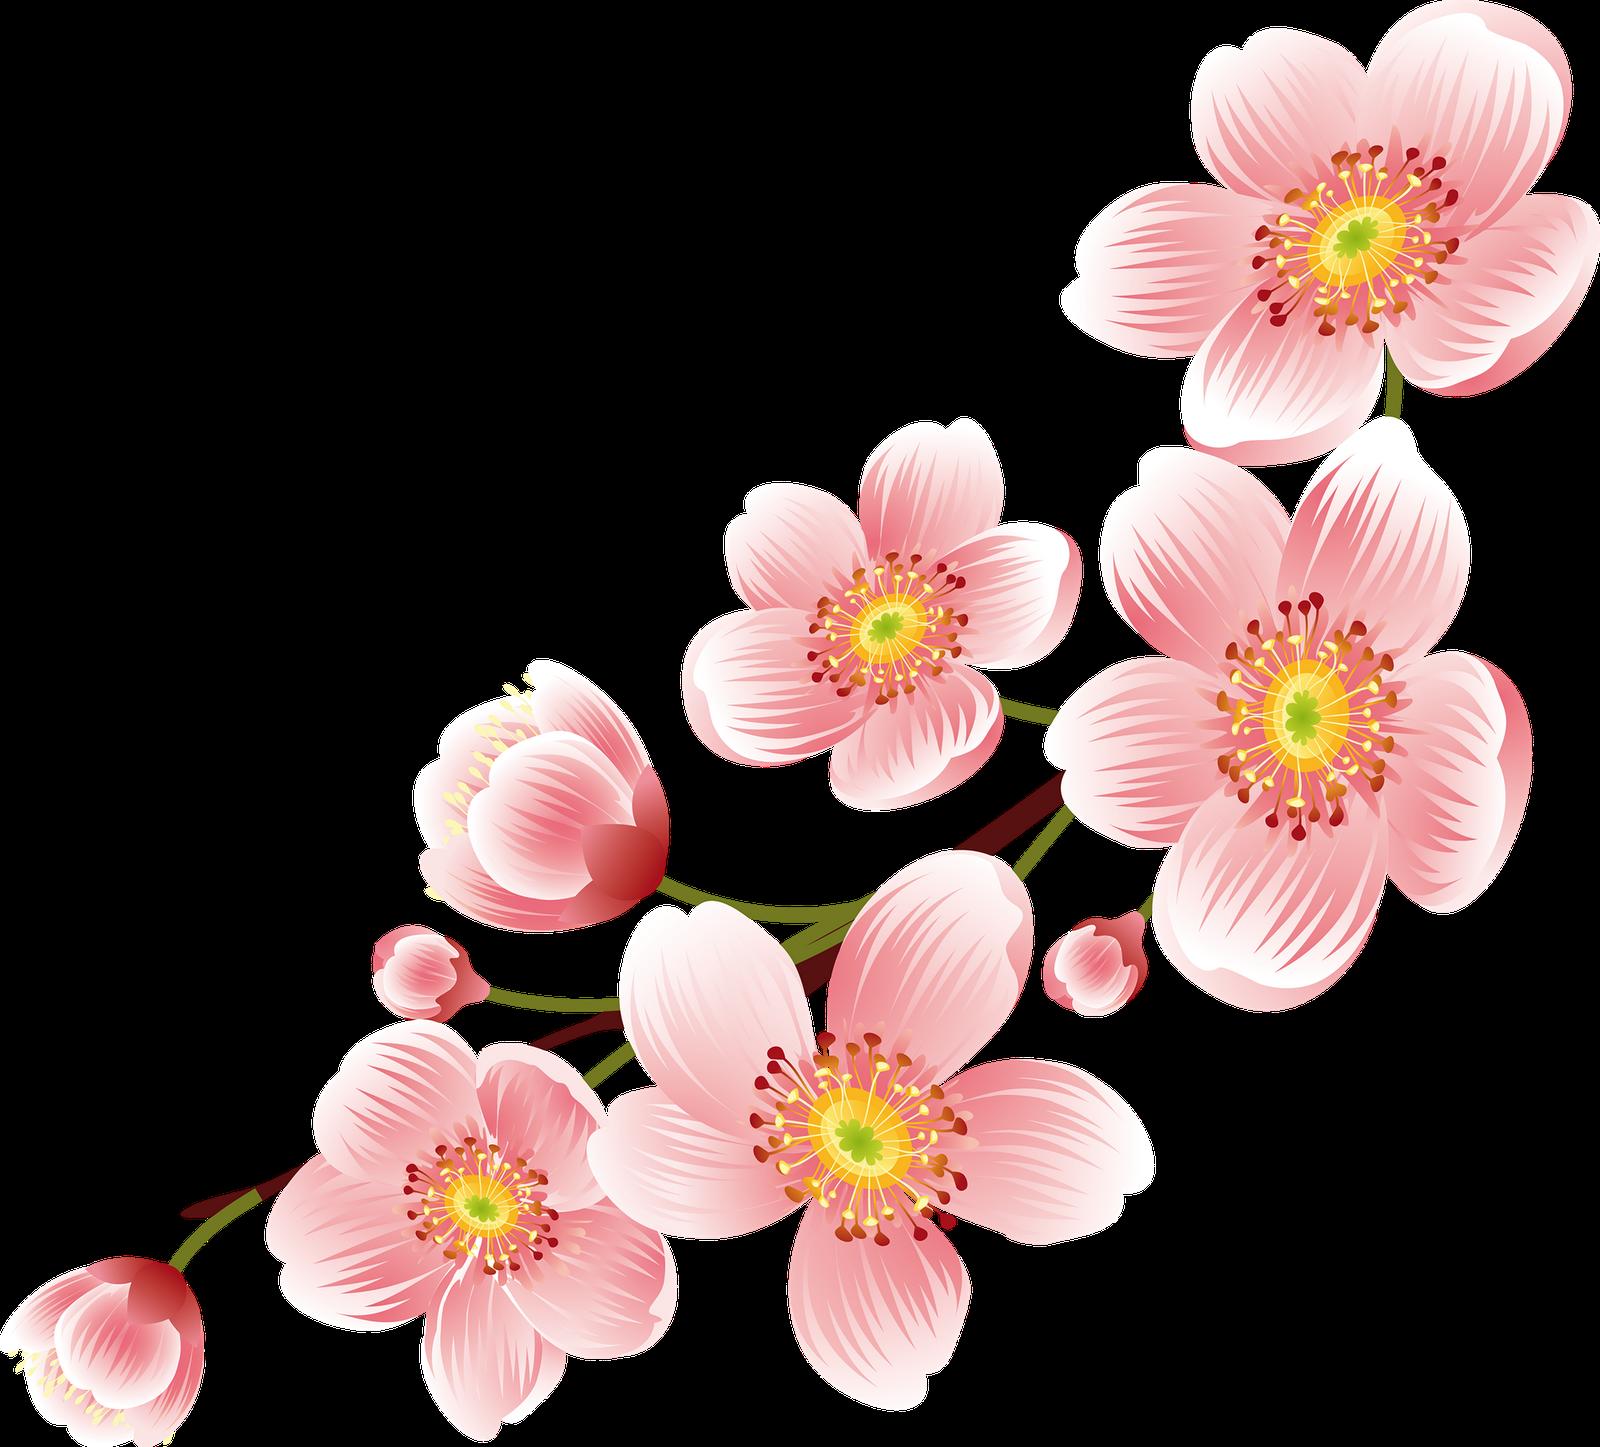 Frames & Png: Cherry Blossom